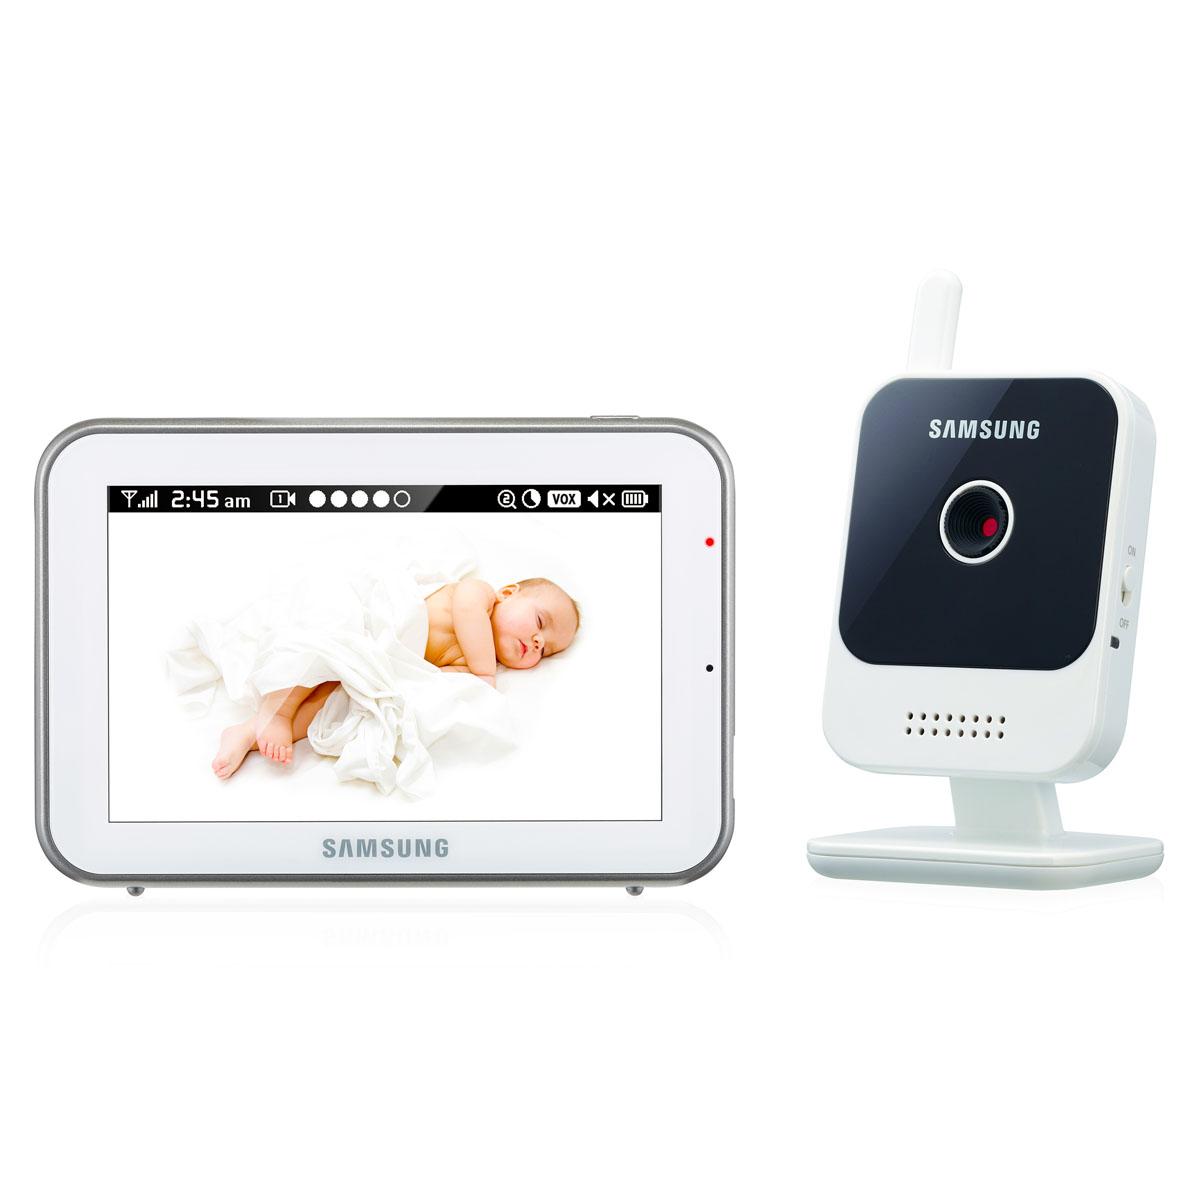 Samsung Видеоняня SEW-3042WP -  Радио и видеоняни